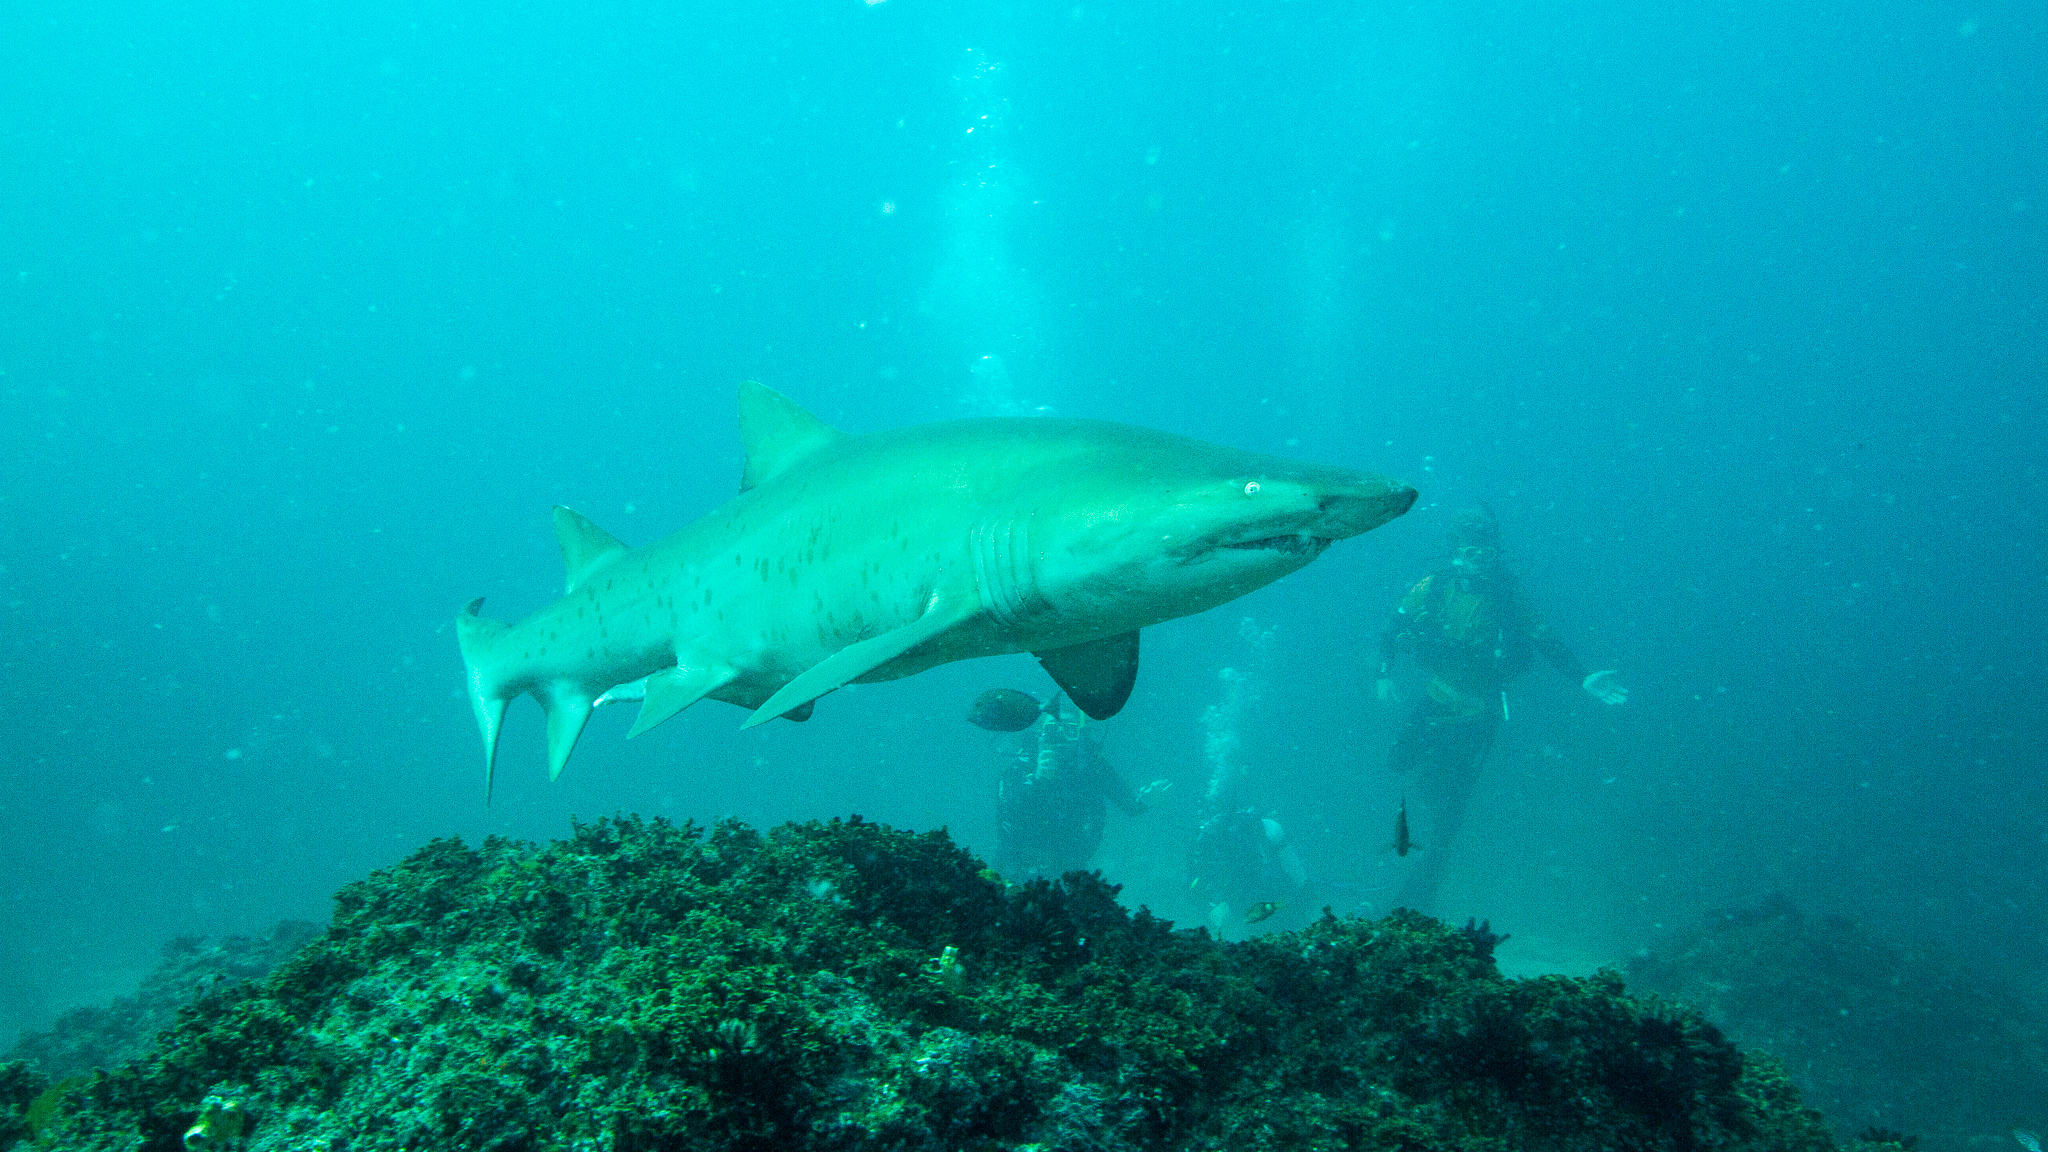 Grey Nurse Shark Julian Rocks NSW Australia